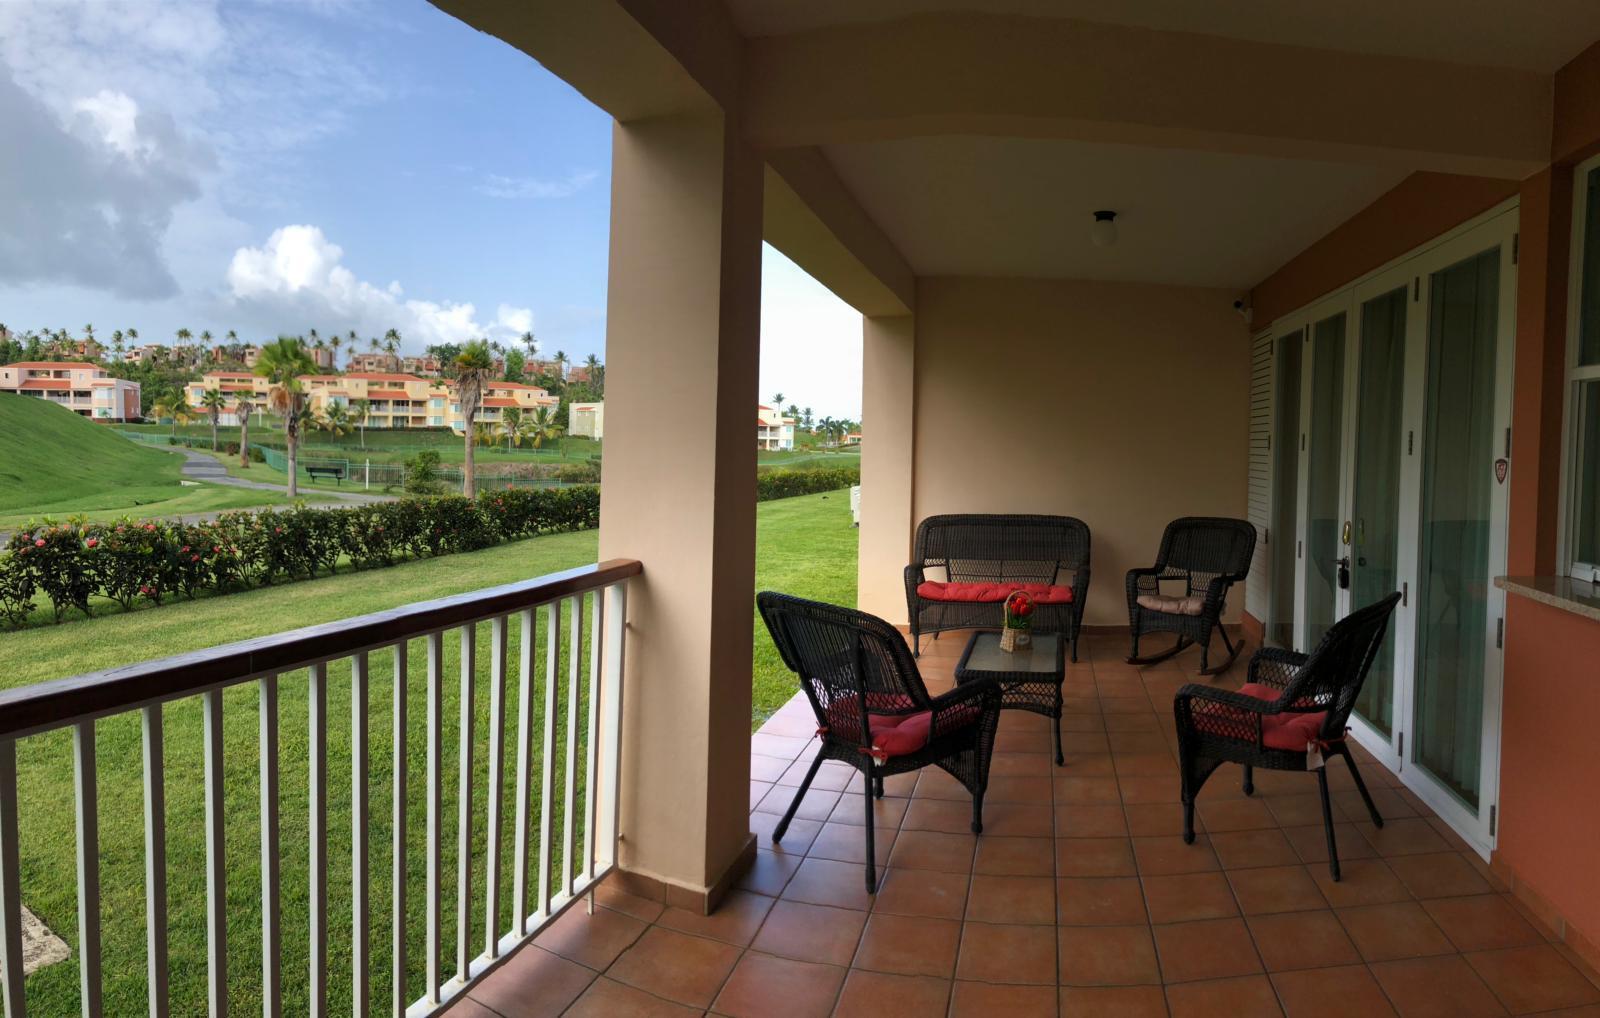 Garden & Balcony view.jpg